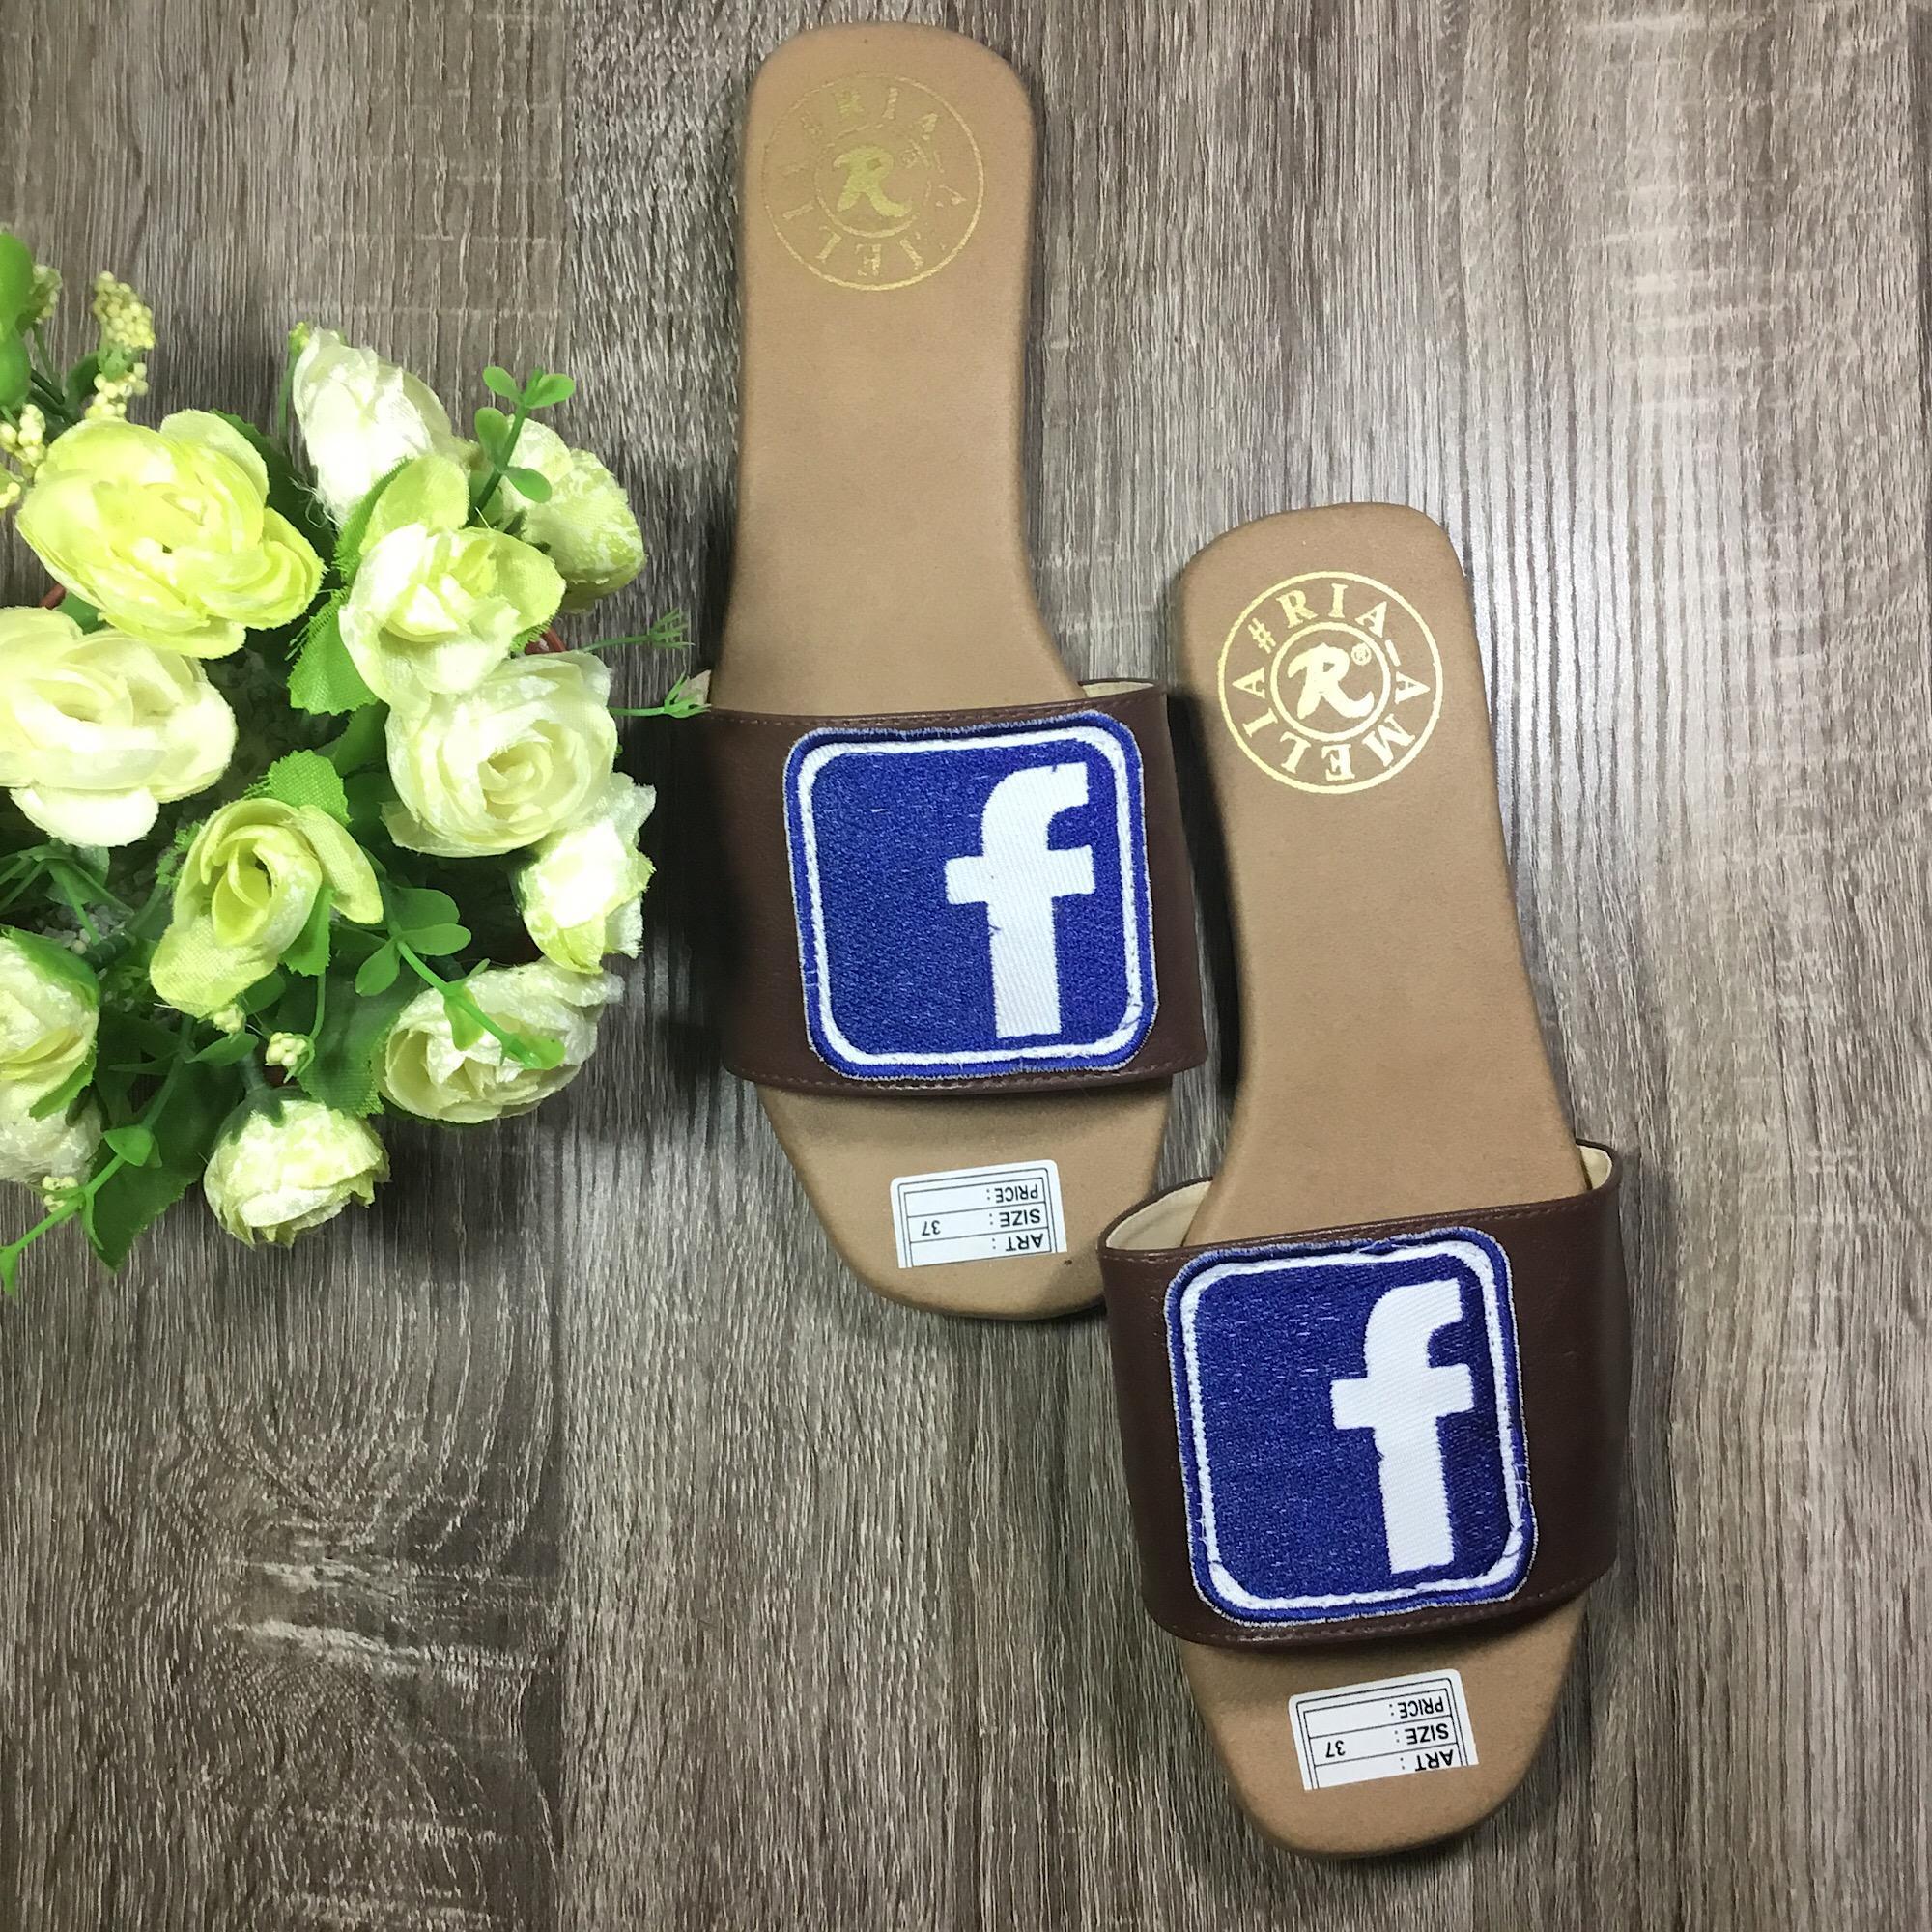 Rafishashoes-Sandal Kokop Facebook-[Navy]